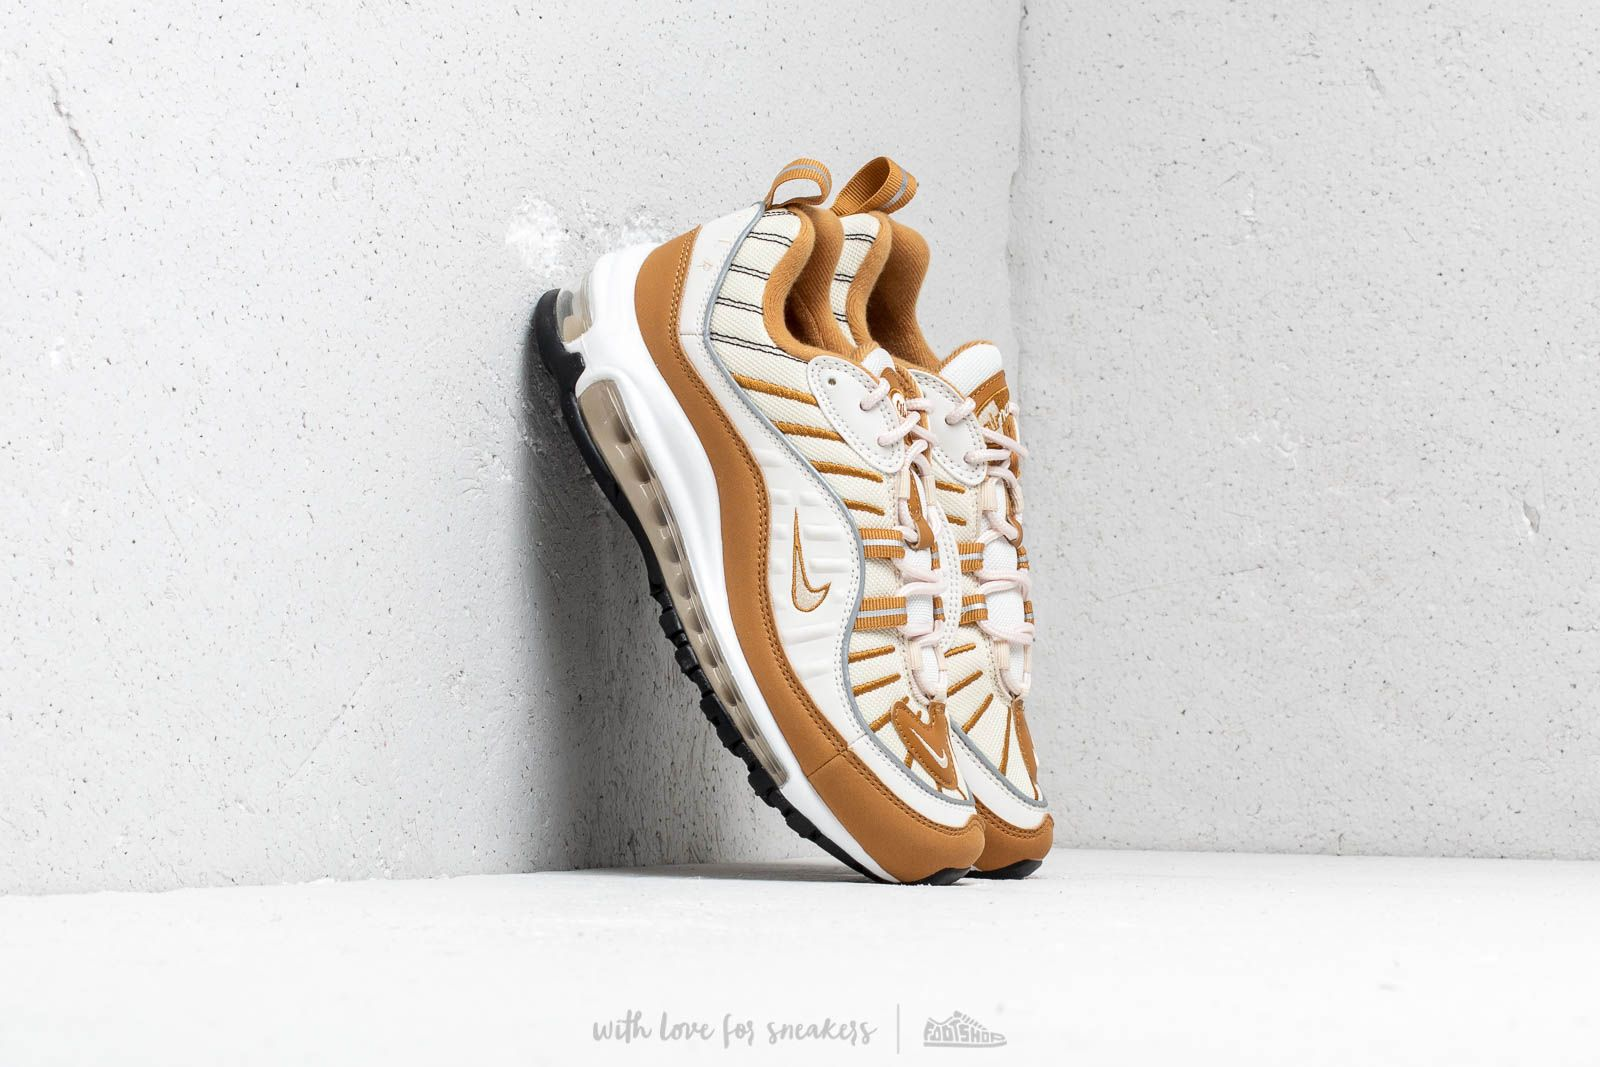 Damesschoenen Nike W Air Max 98 Phantom/ Beach-Wheat-Reflect Silver